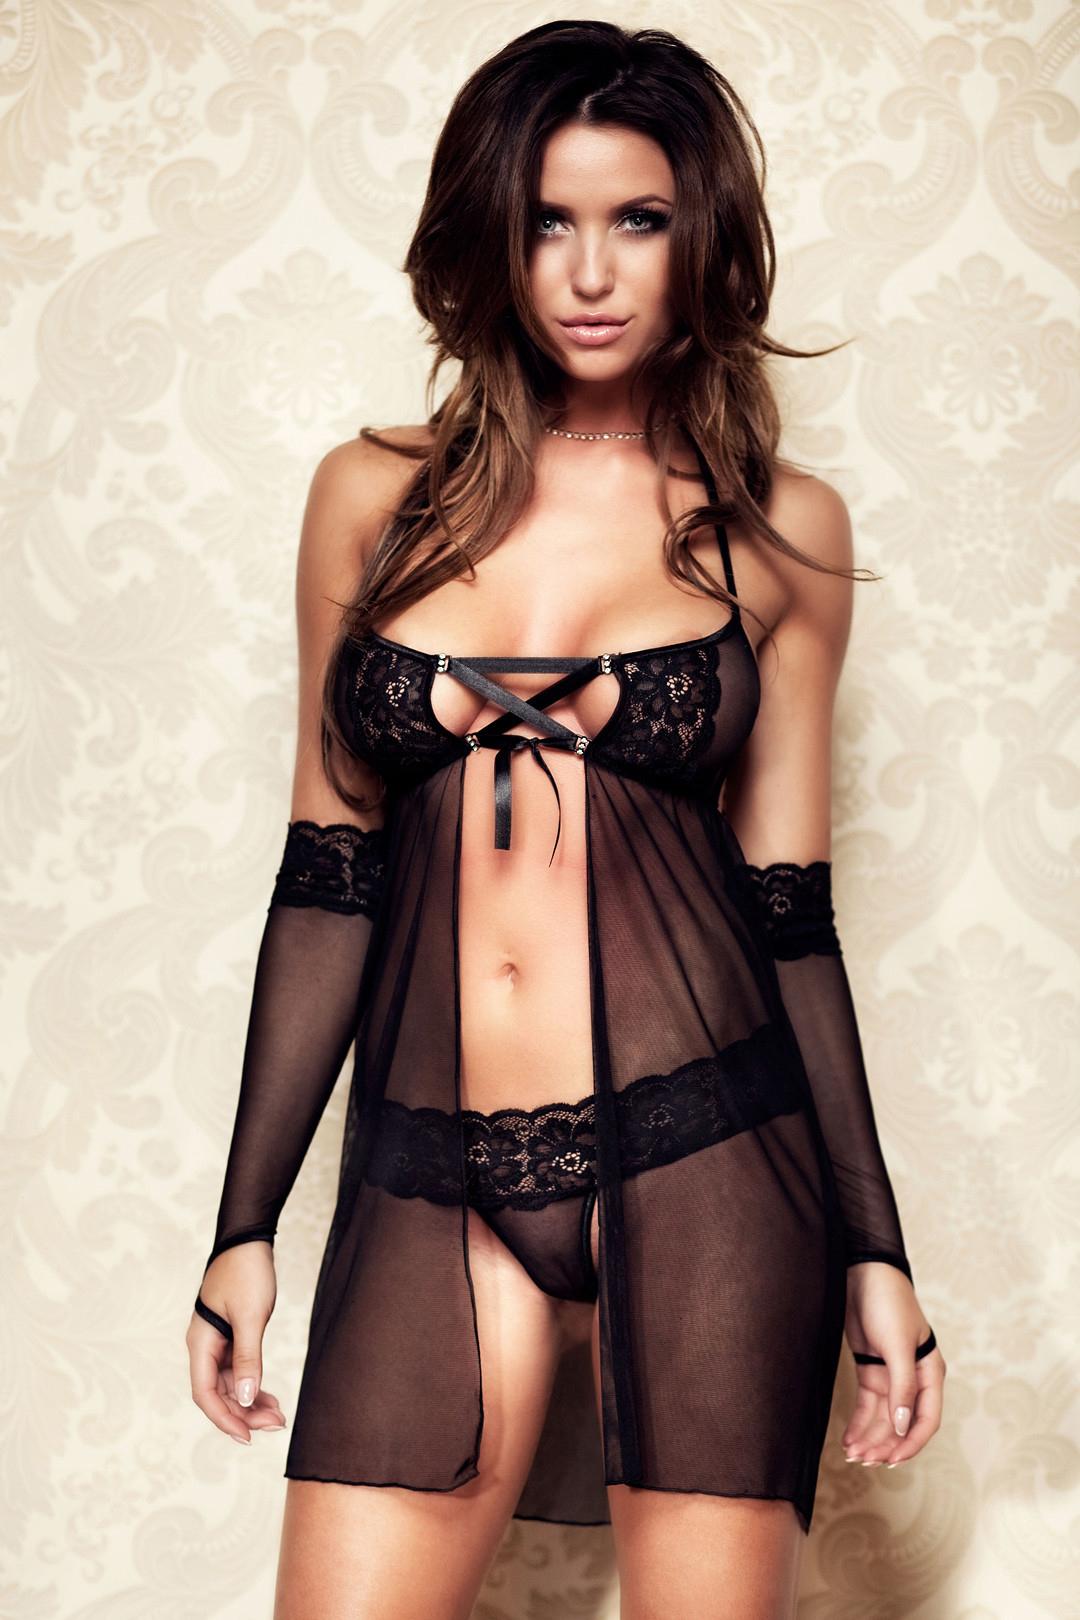 hot women wearing see through lingerie - Monika Pietrasinska